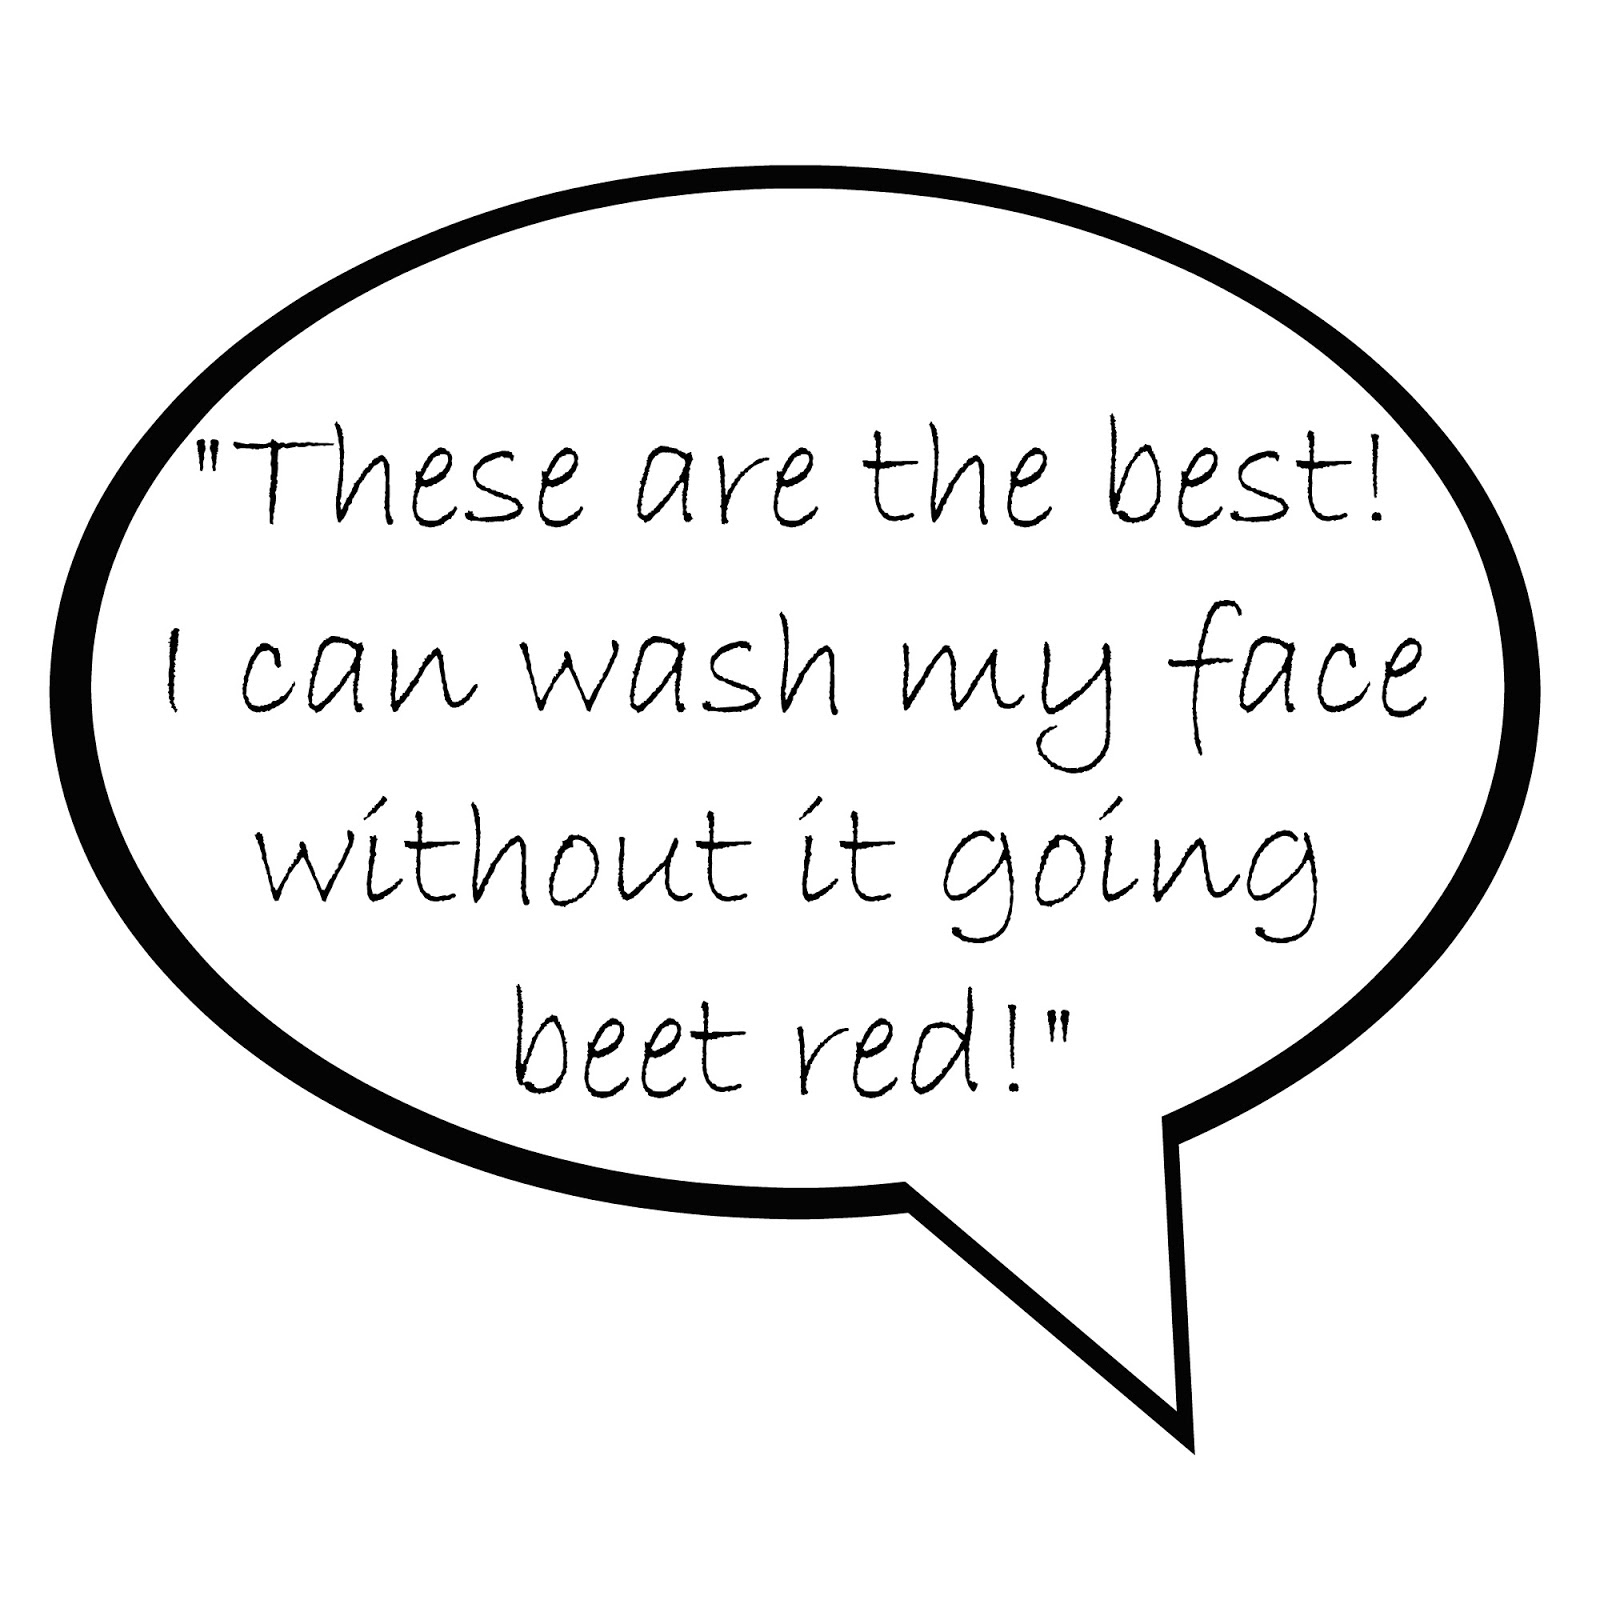 rosacea washcloths, washcloths for senstive skin, soothing face cloths non irritating